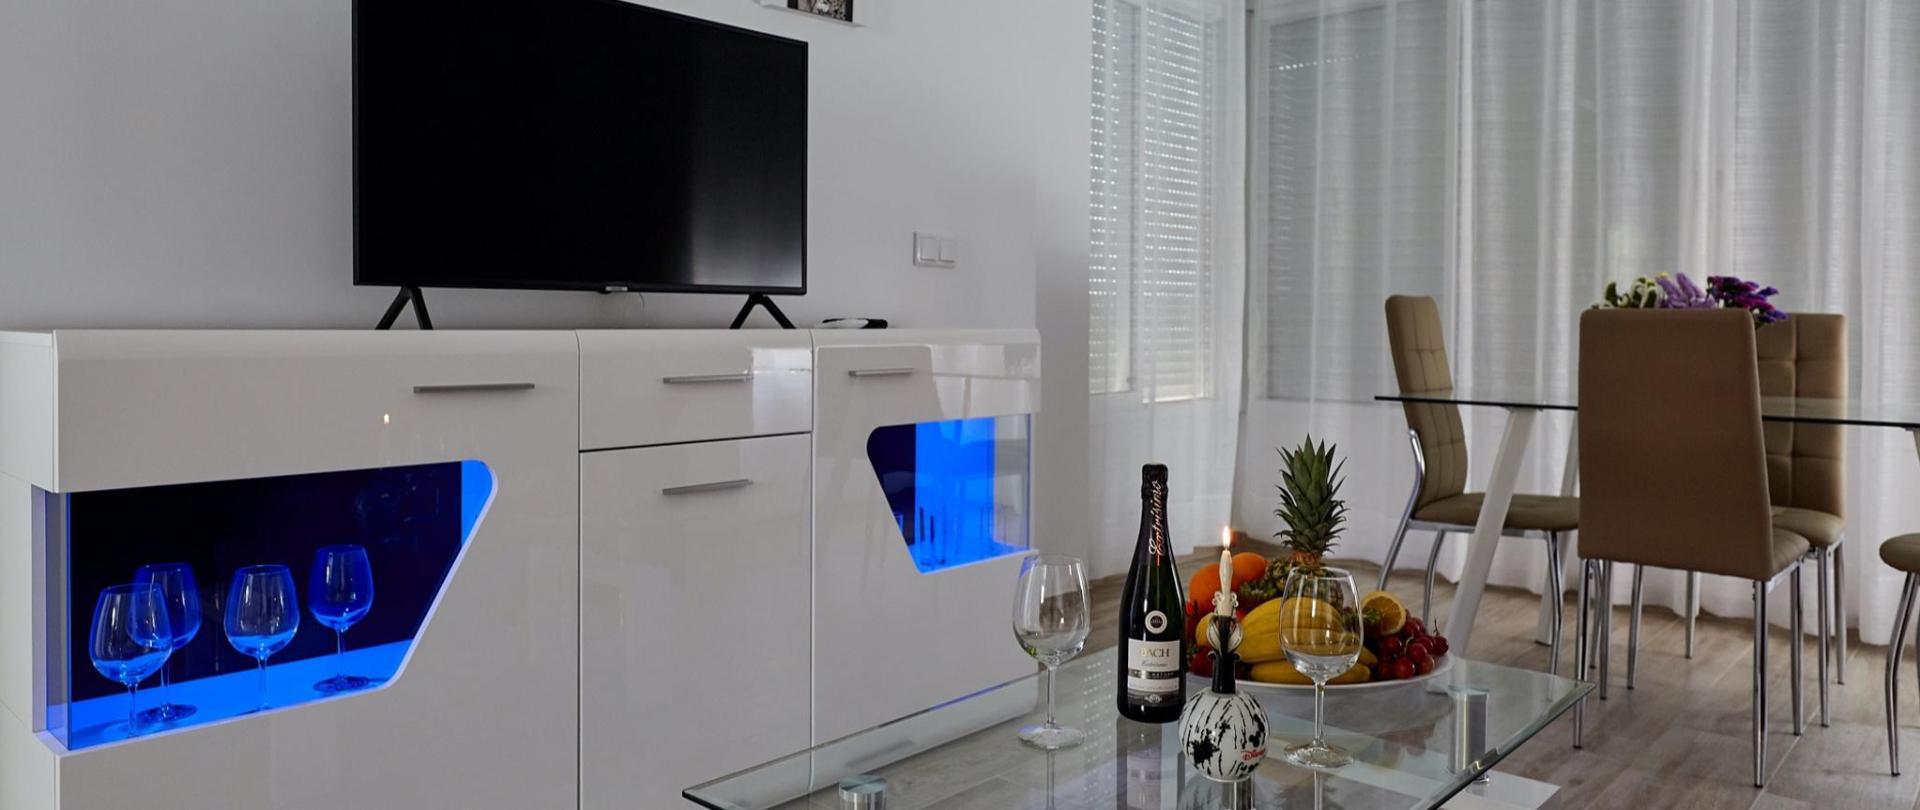 Sonrisa Apartments - Superior Apartments4.jpg